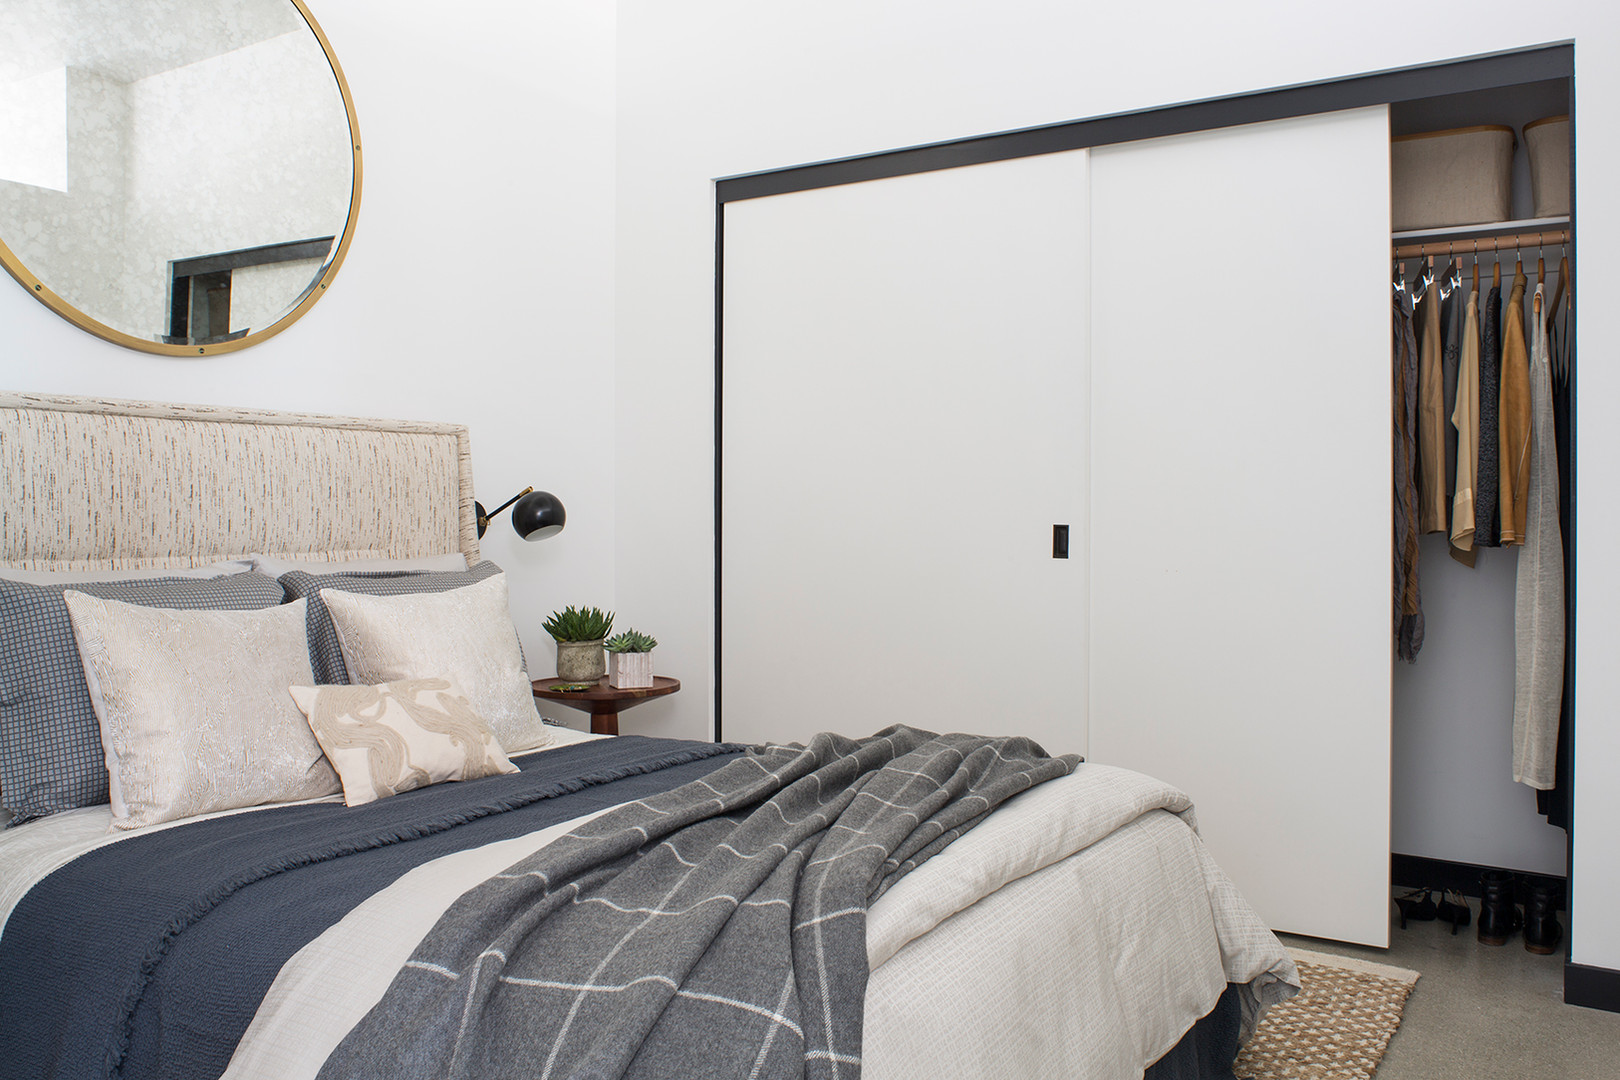 Serene Modern Bedroom by Kelly Wearstler